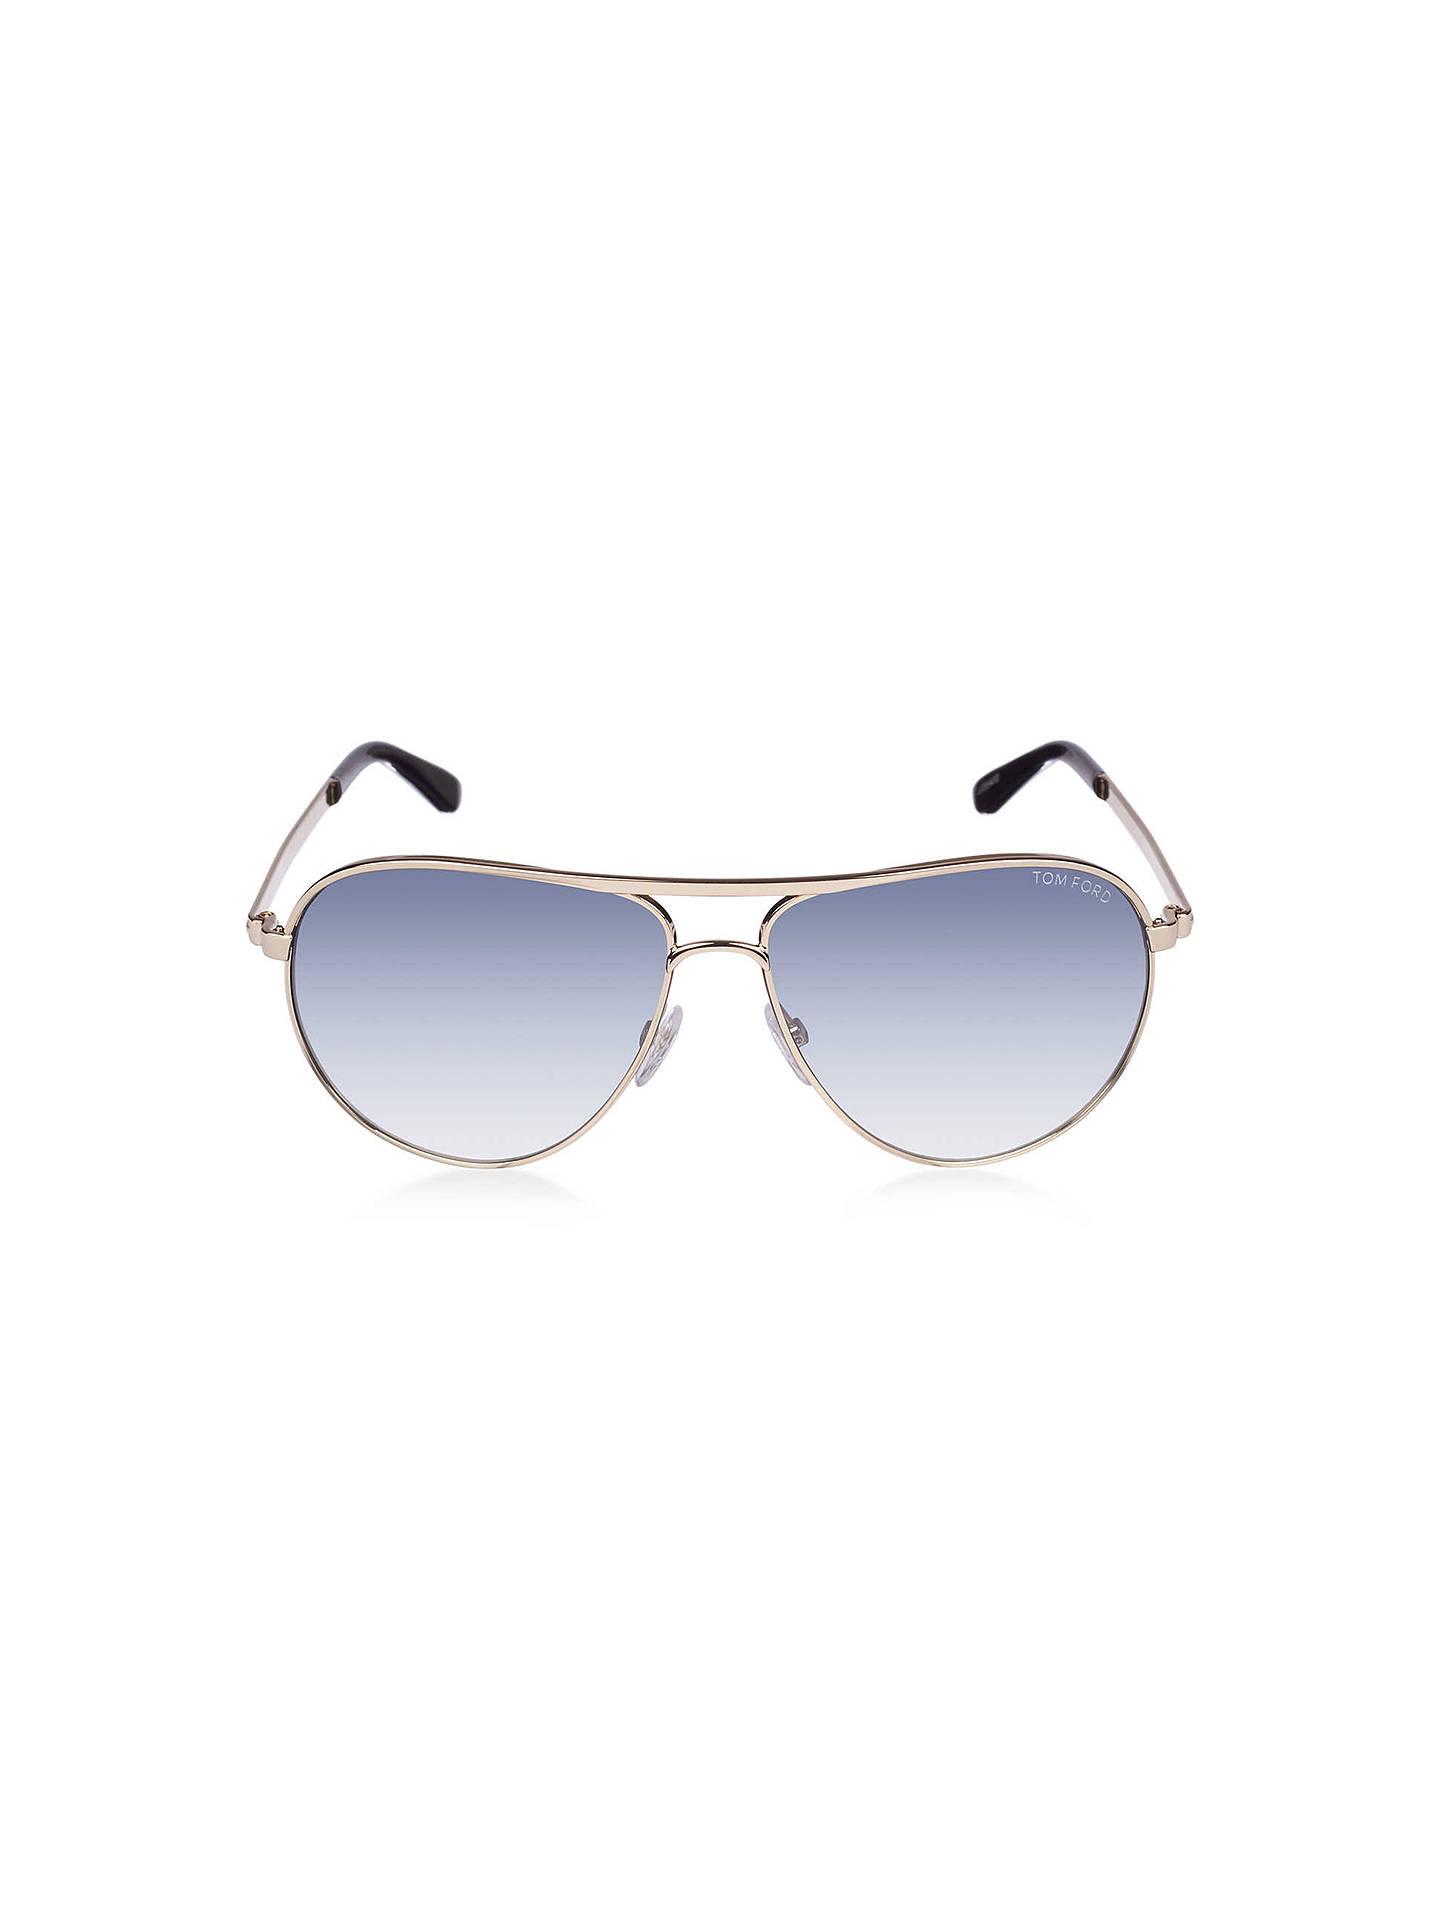 4dde3f3966fc7 ... Buy TOM FORD FT0144 Marko Aviator Sunglasses